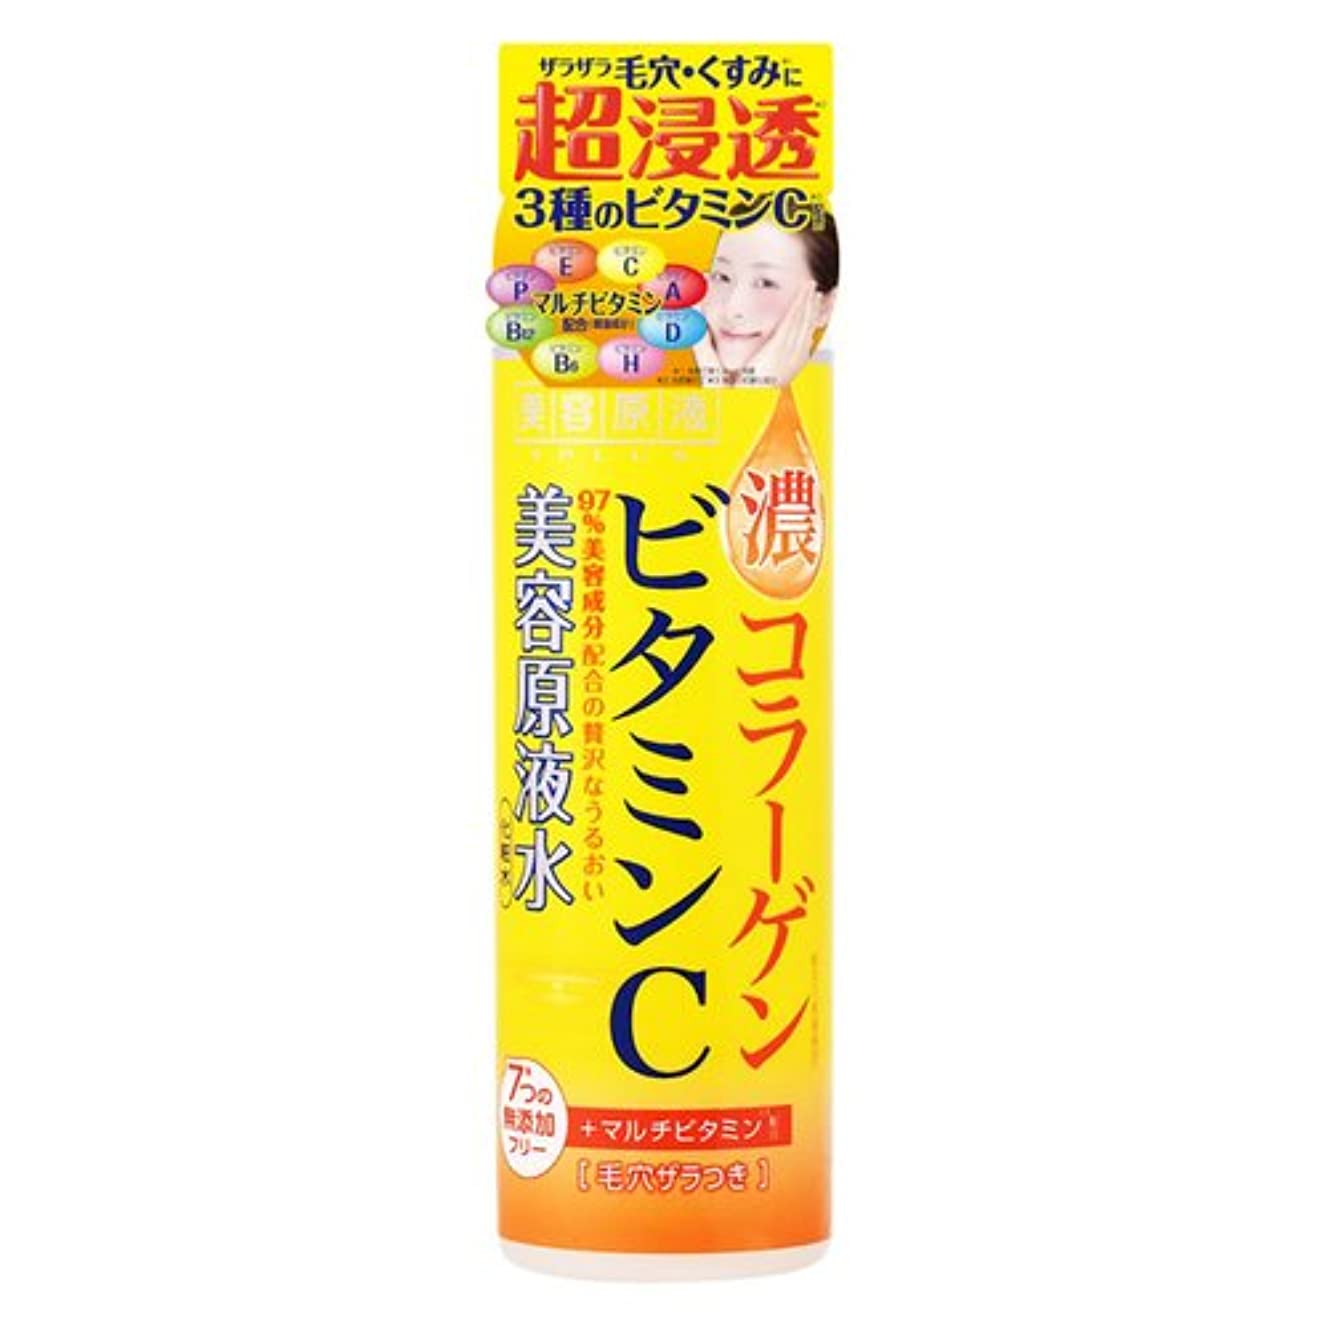 正確さ滑り台国歌美容原液 超潤化粧水VC 185mL